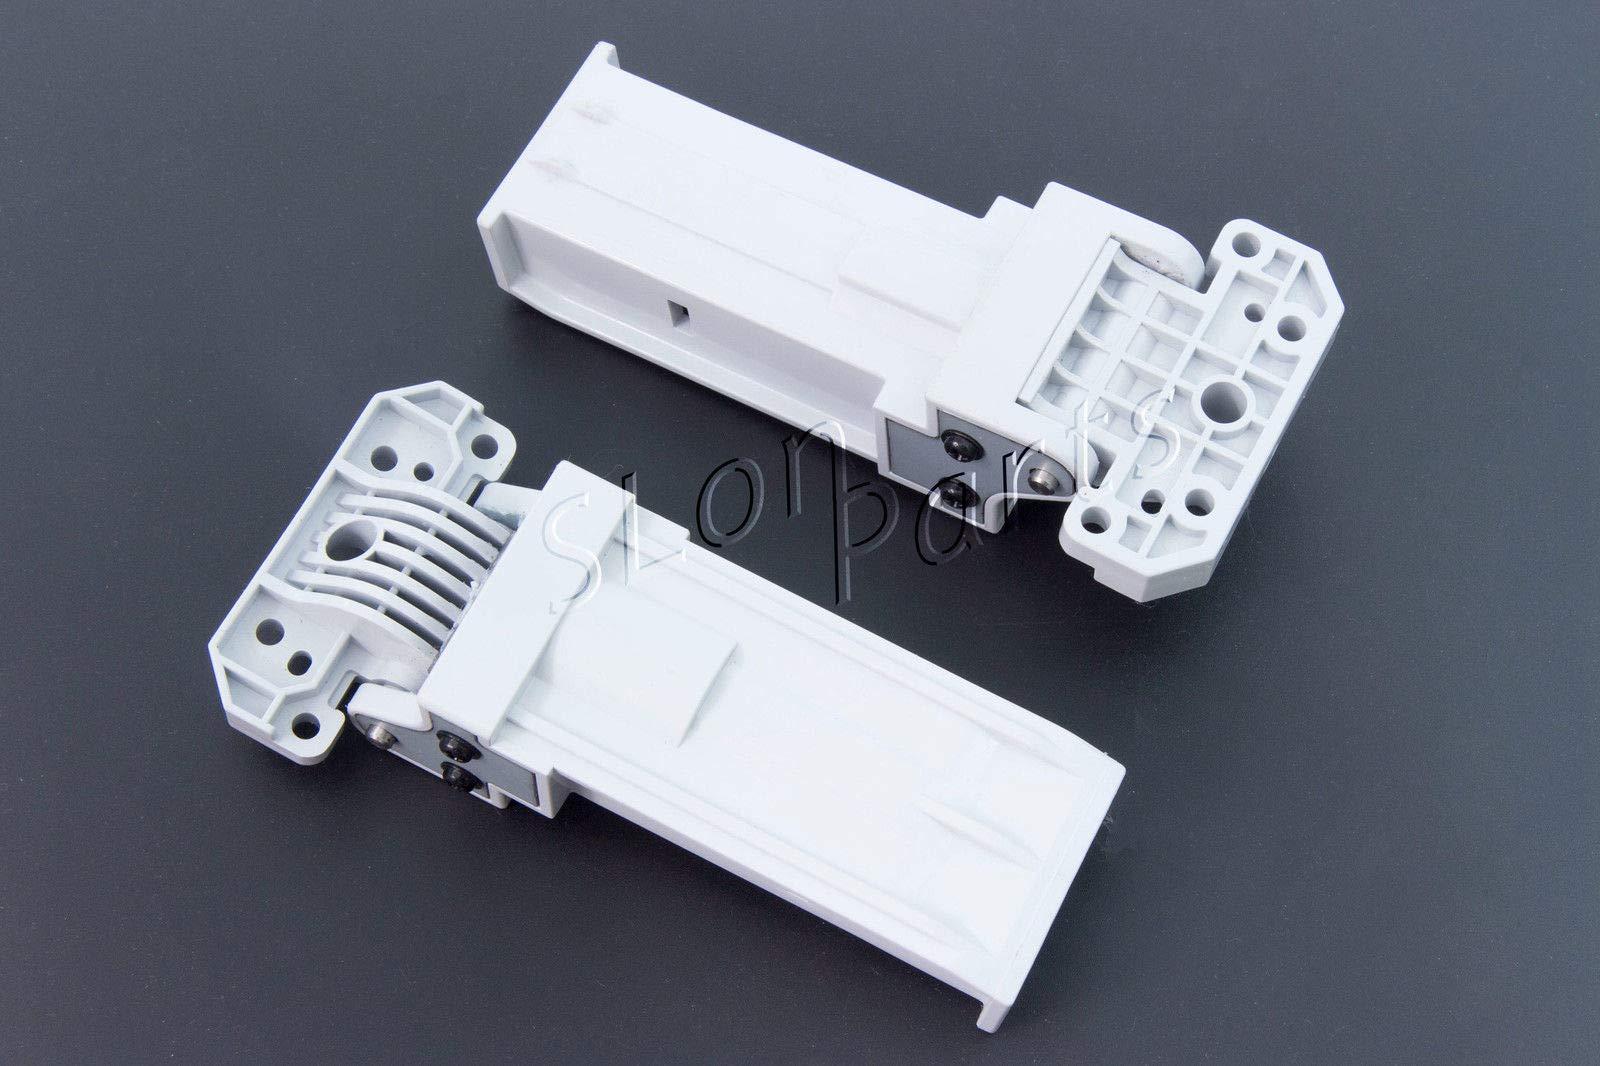 2PCS Yanzeo Q7404-60029 Q7404-60024 Q7404-60025 ADF Hinge Assy ASM Assy Hinge HR for HP Laserjet 500 MFP M525 M575 M521 M775 CM4540